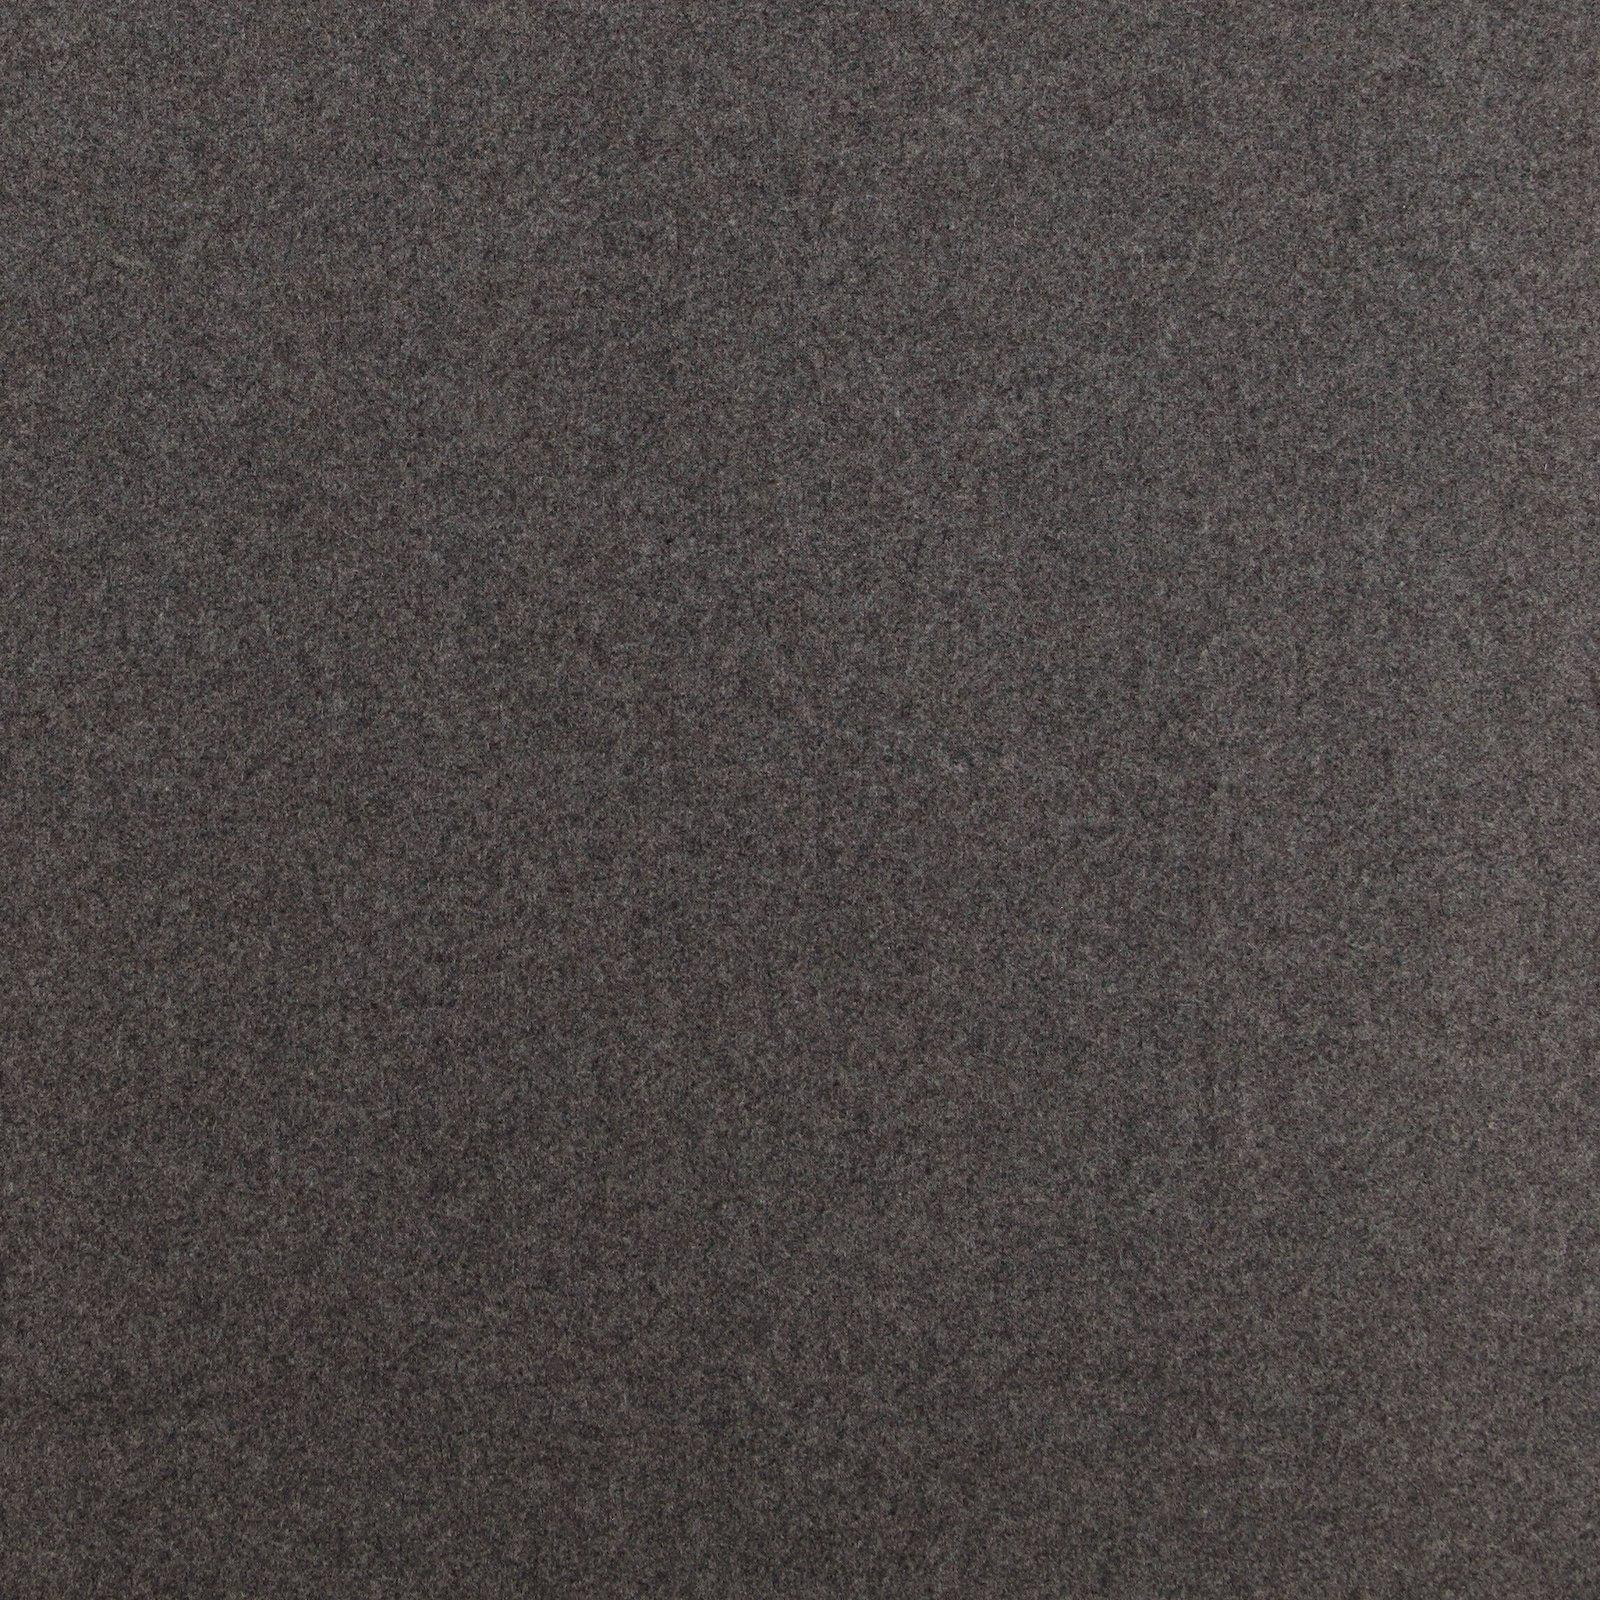 Woven wool grey melange